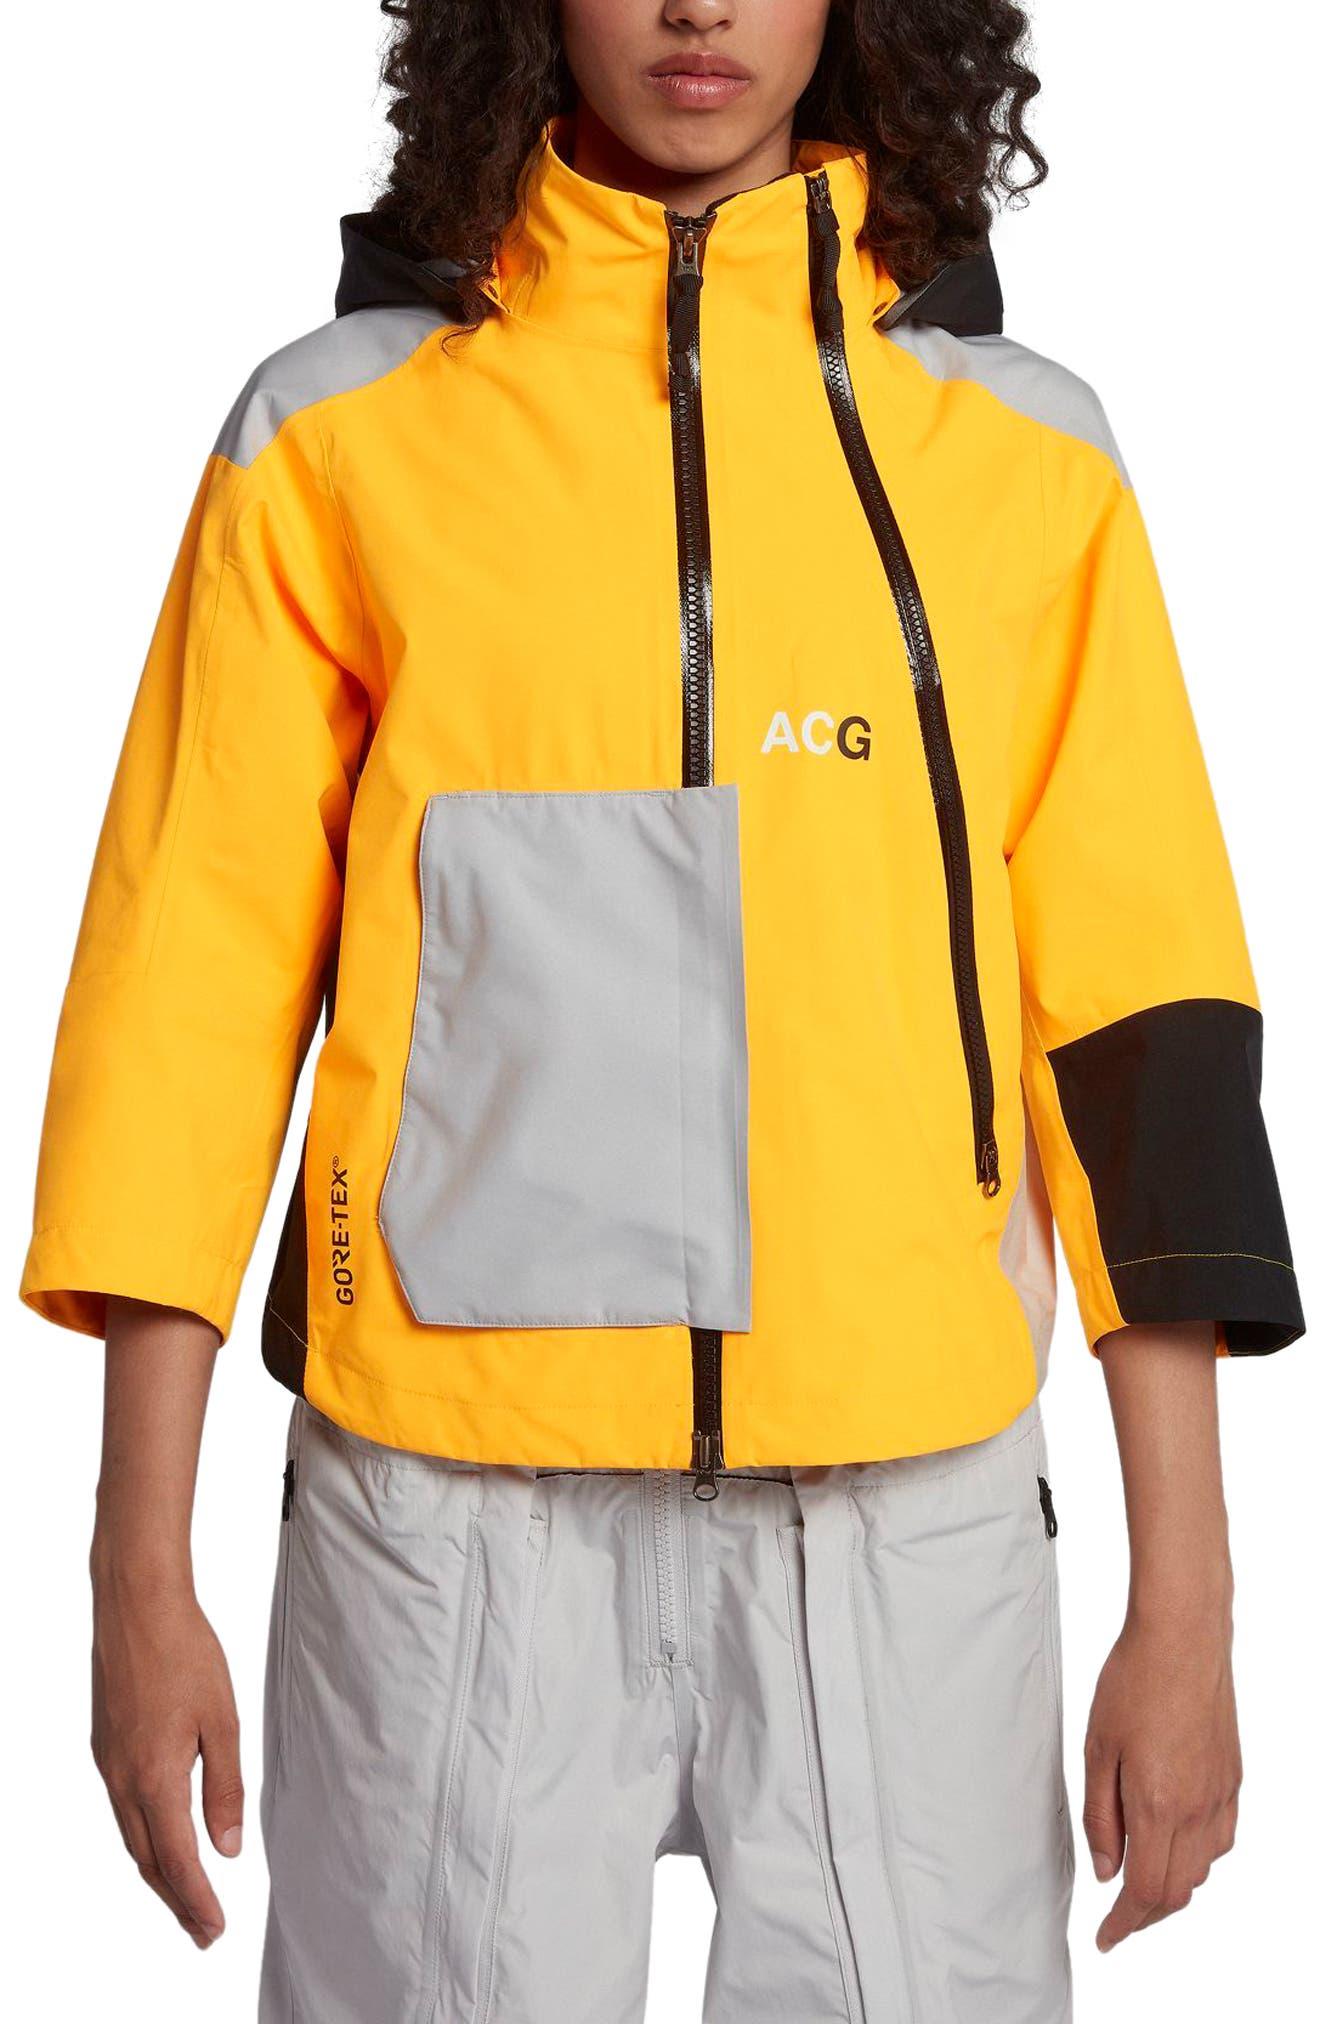 NikeLab ACG Gore-Tex<sup>®</sup> Women's Jacket,                             Alternate thumbnail 6, color,